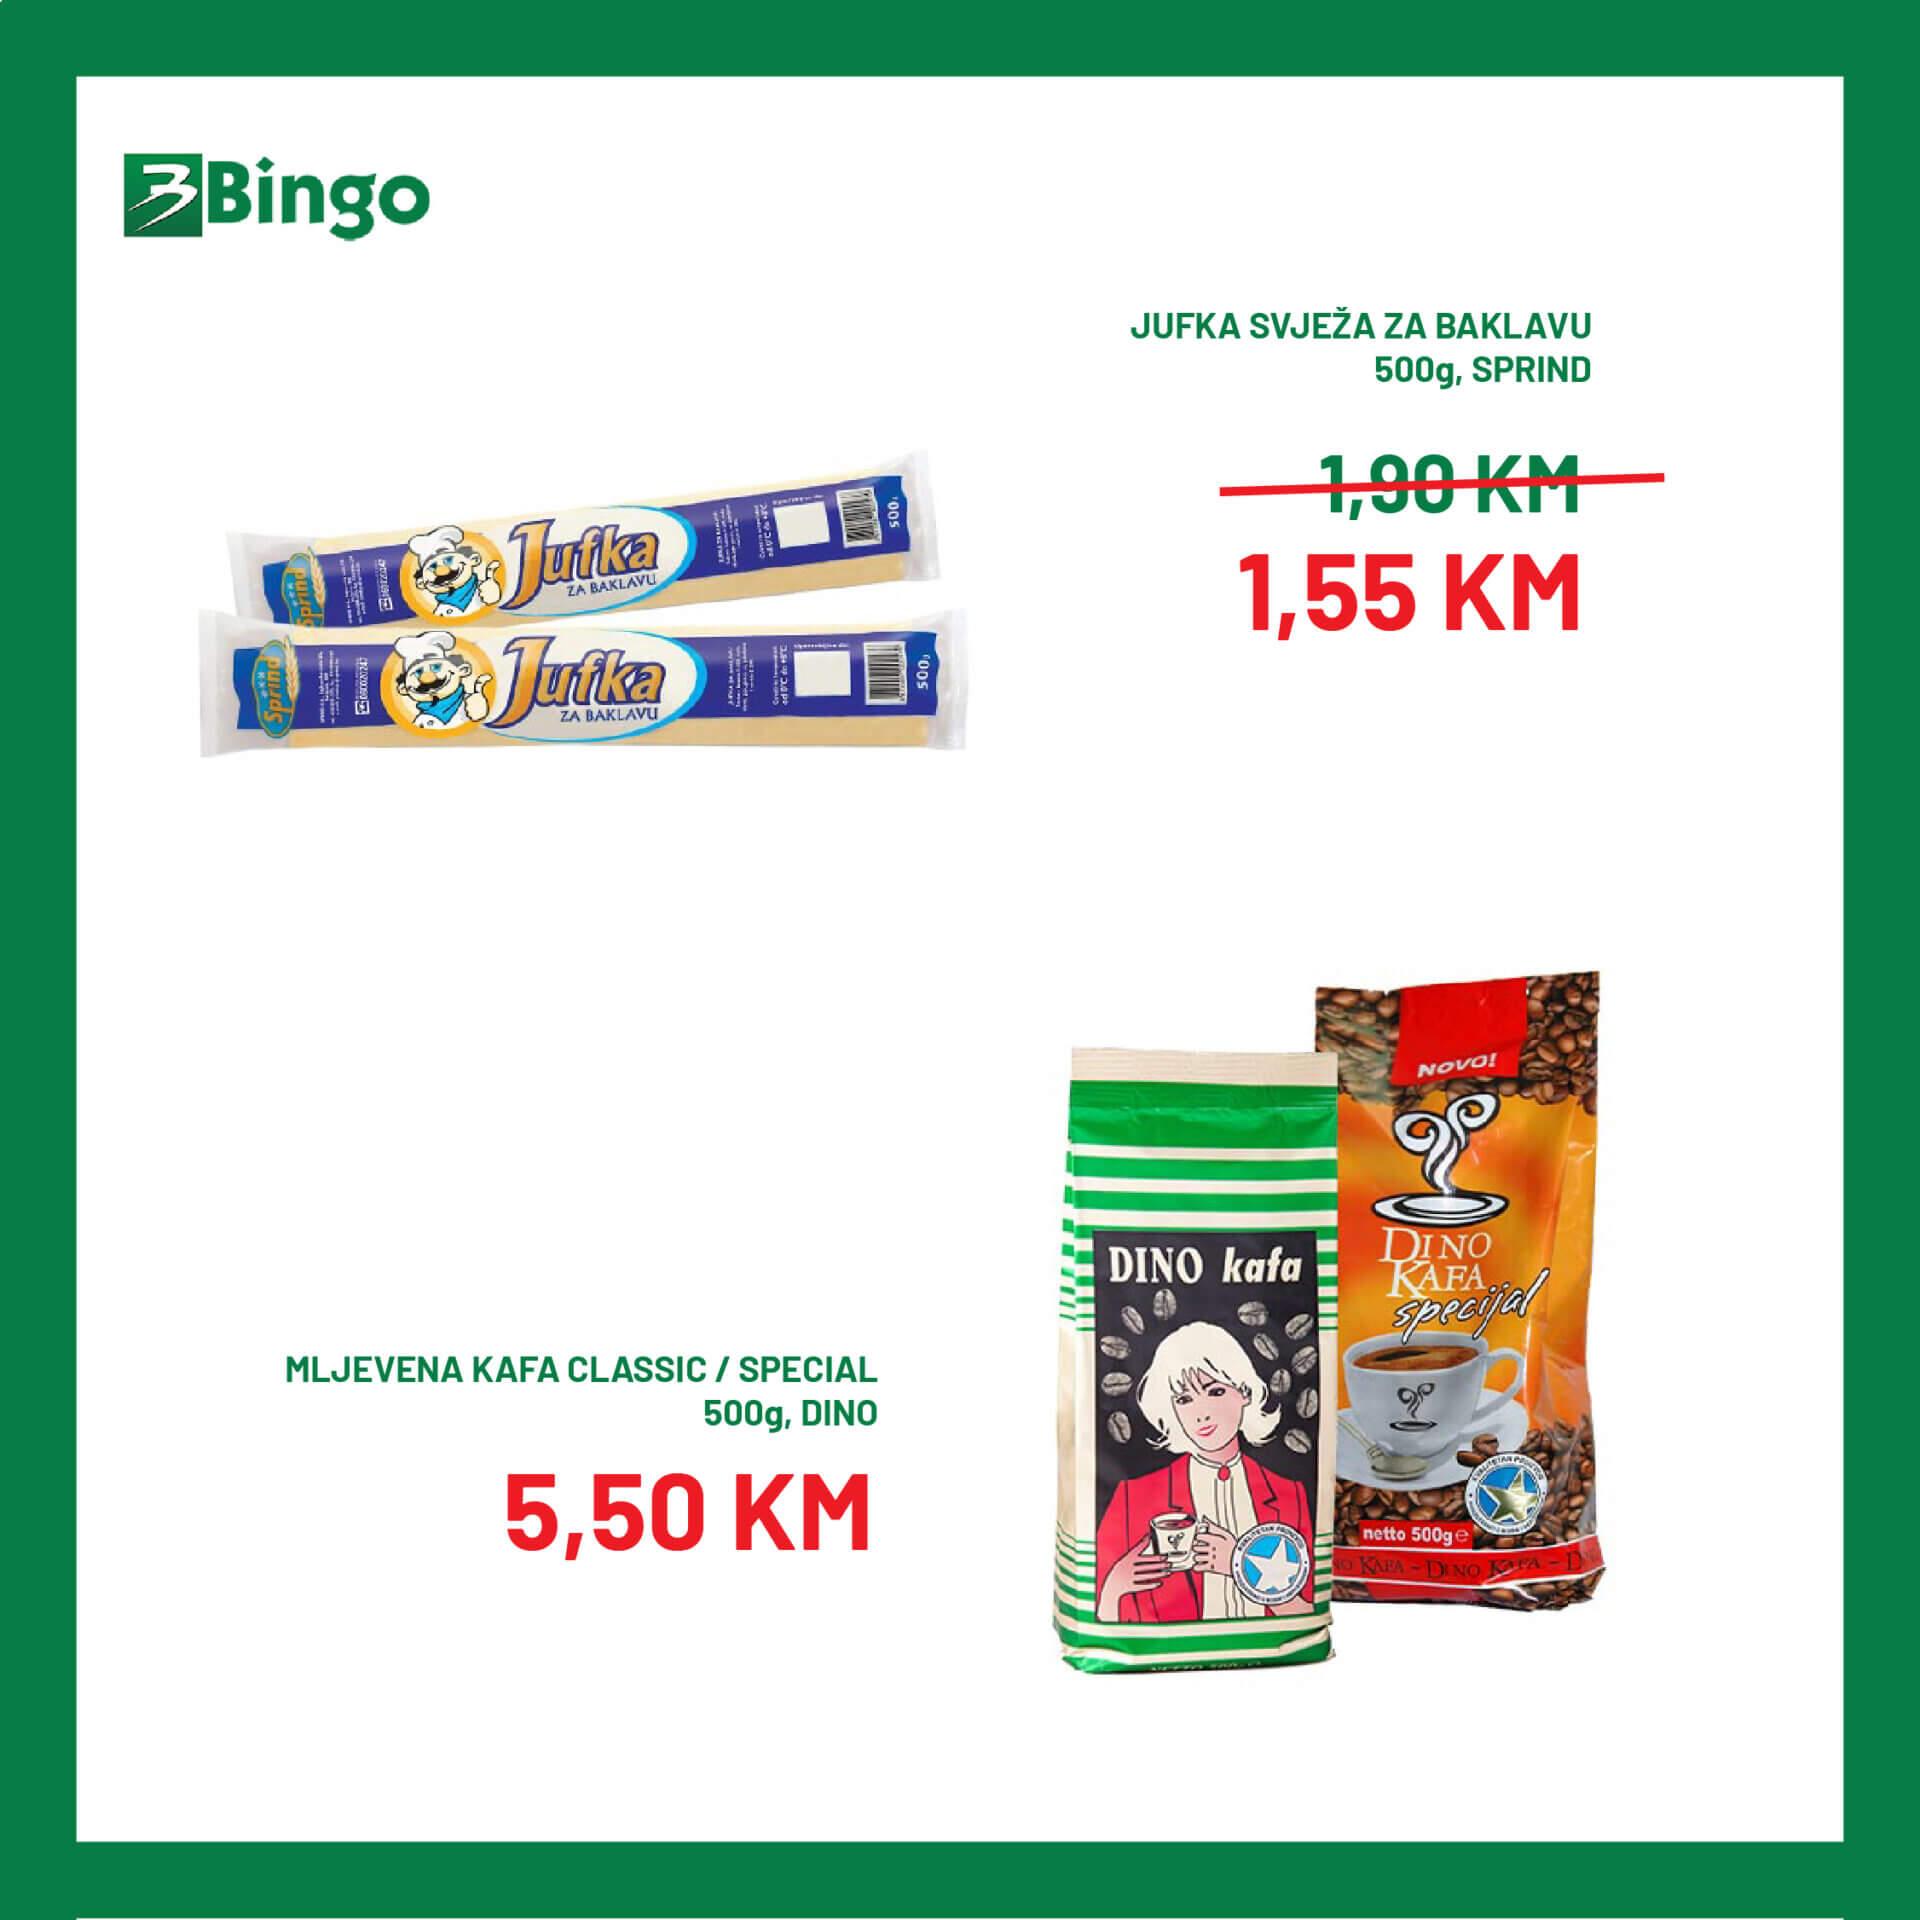 BINGO katalog Page 4